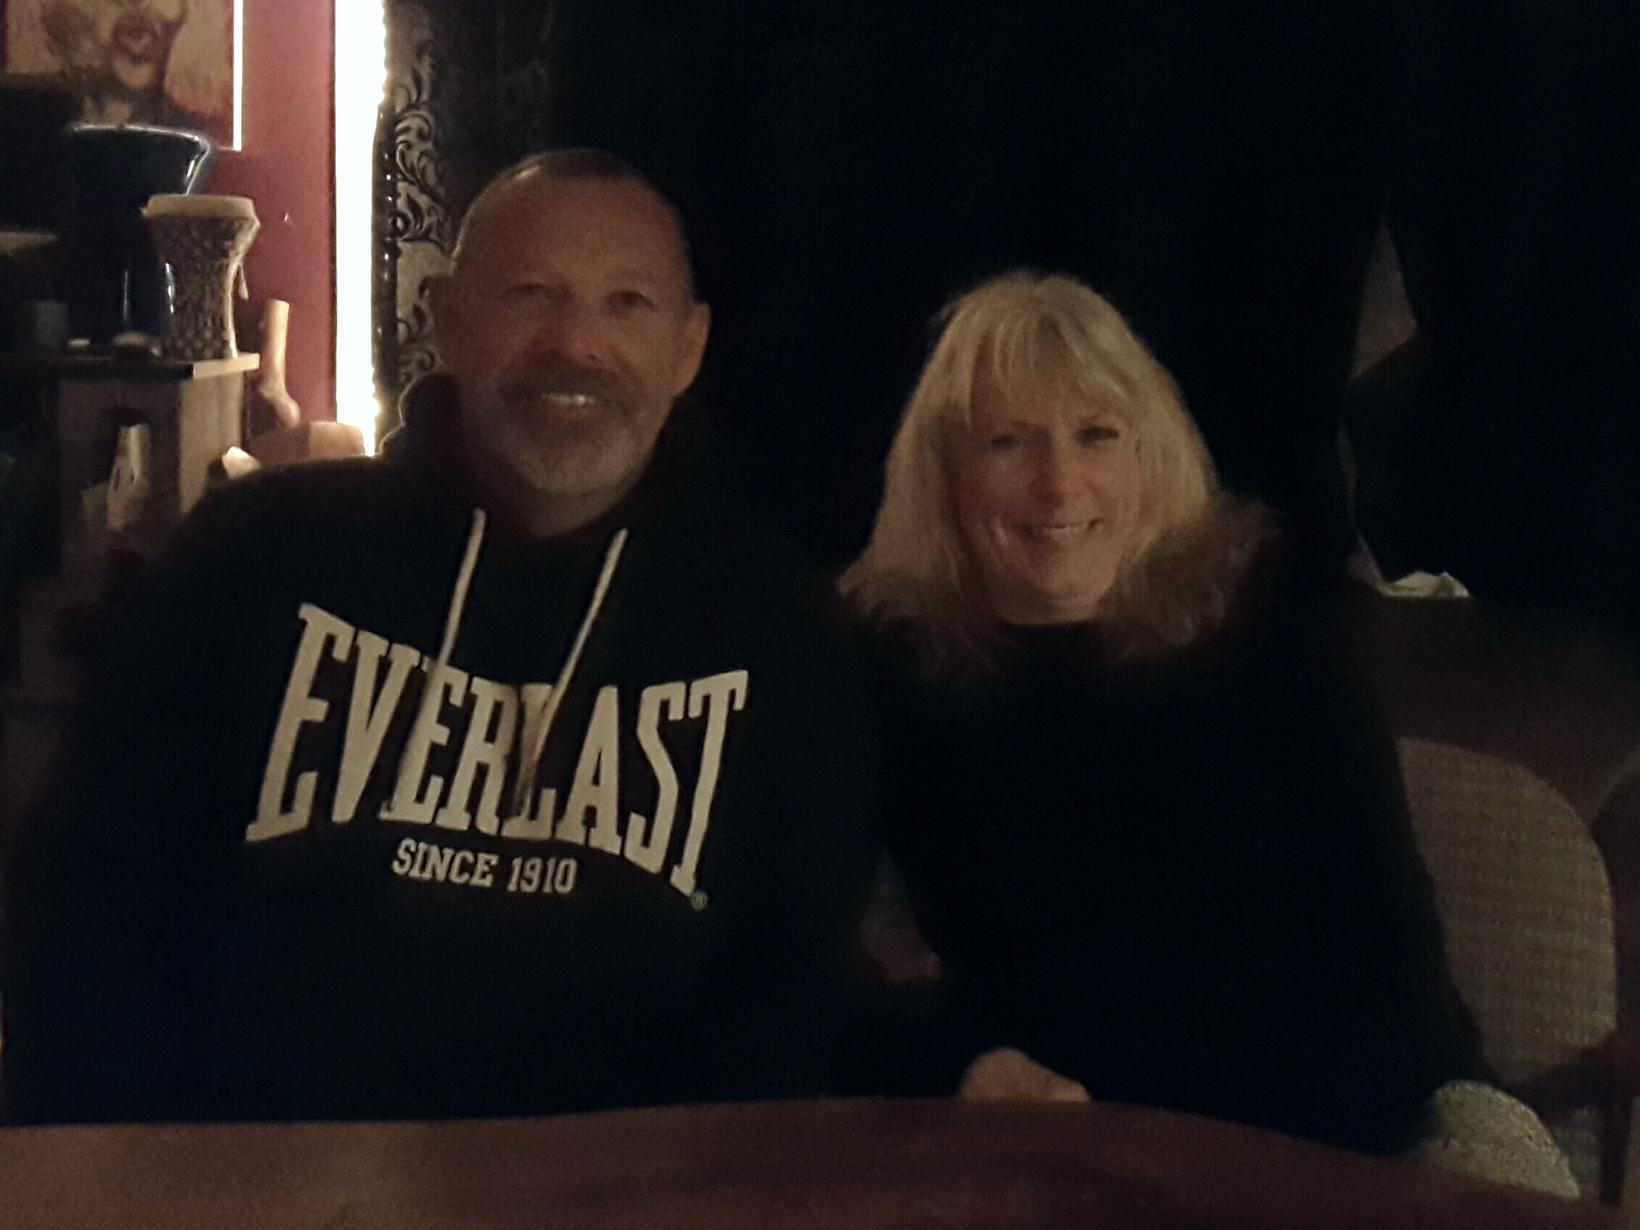 Patrece & Greg from Wellsford, New Zealand